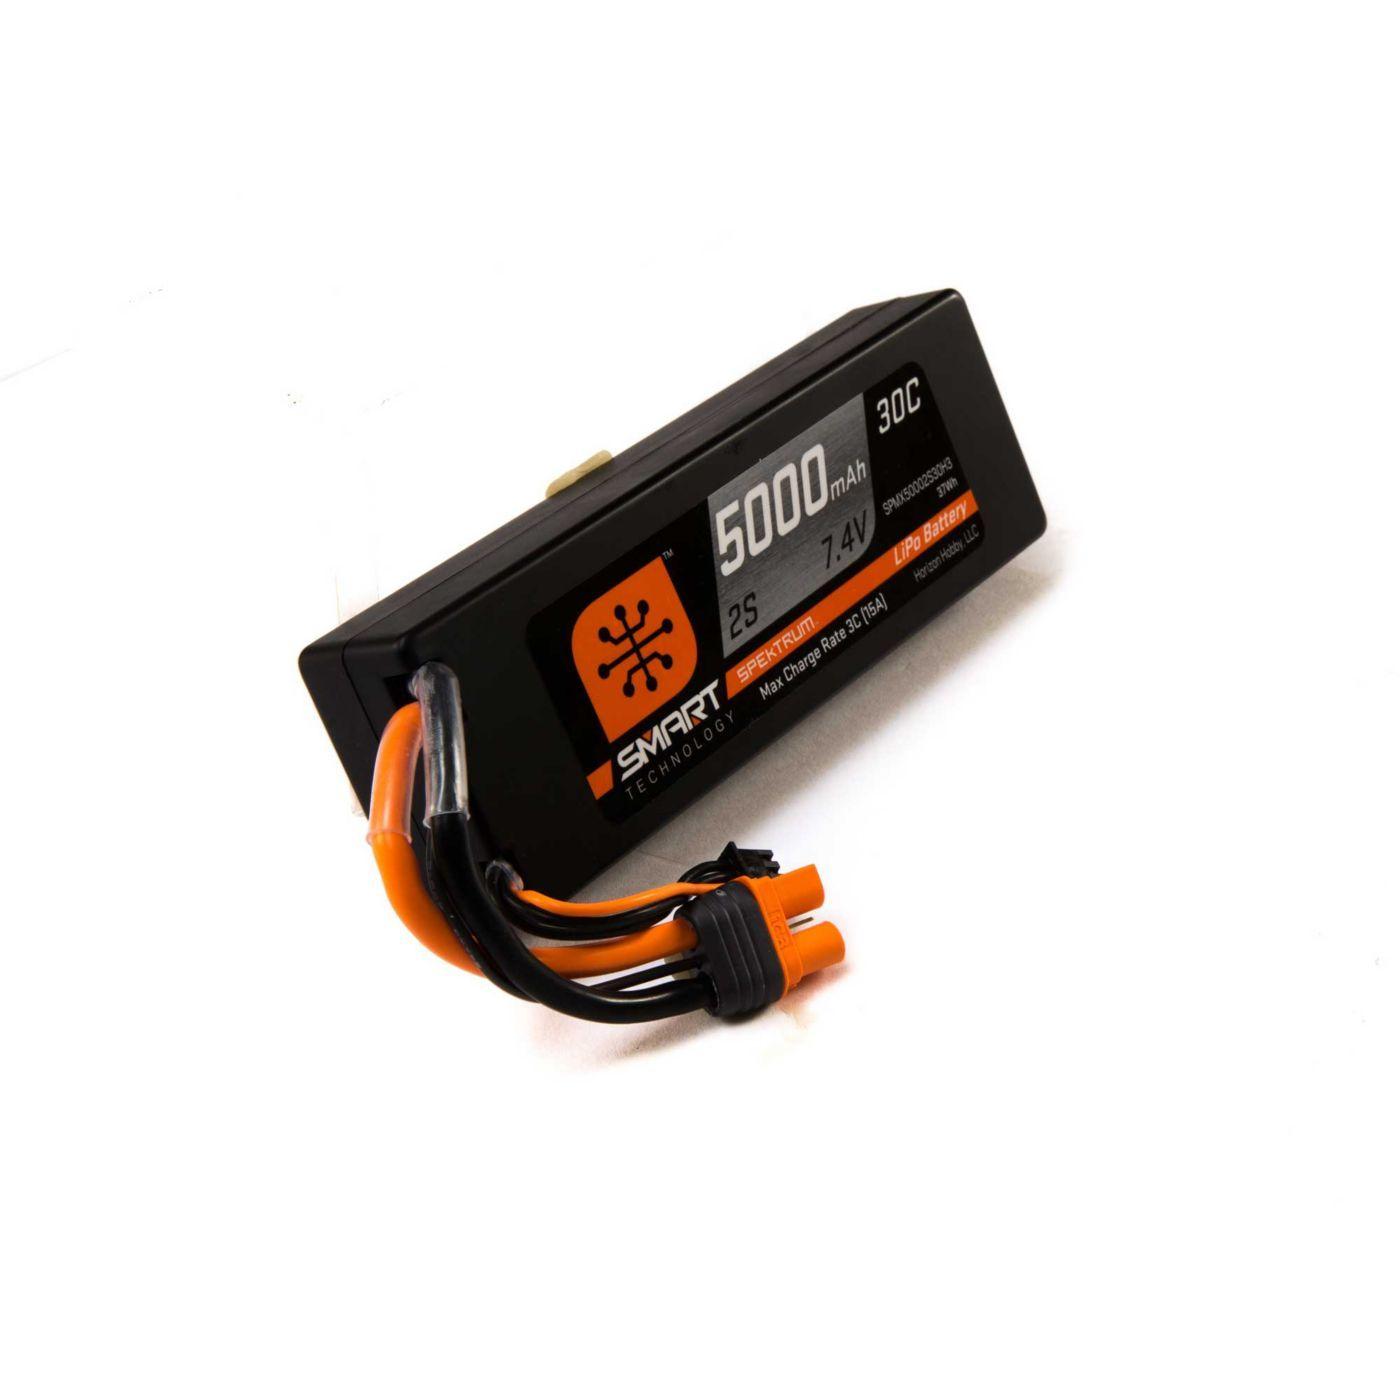 7.4V 5000mAh 2S 30C Smart LiPo Battery, Hardcase, IC3